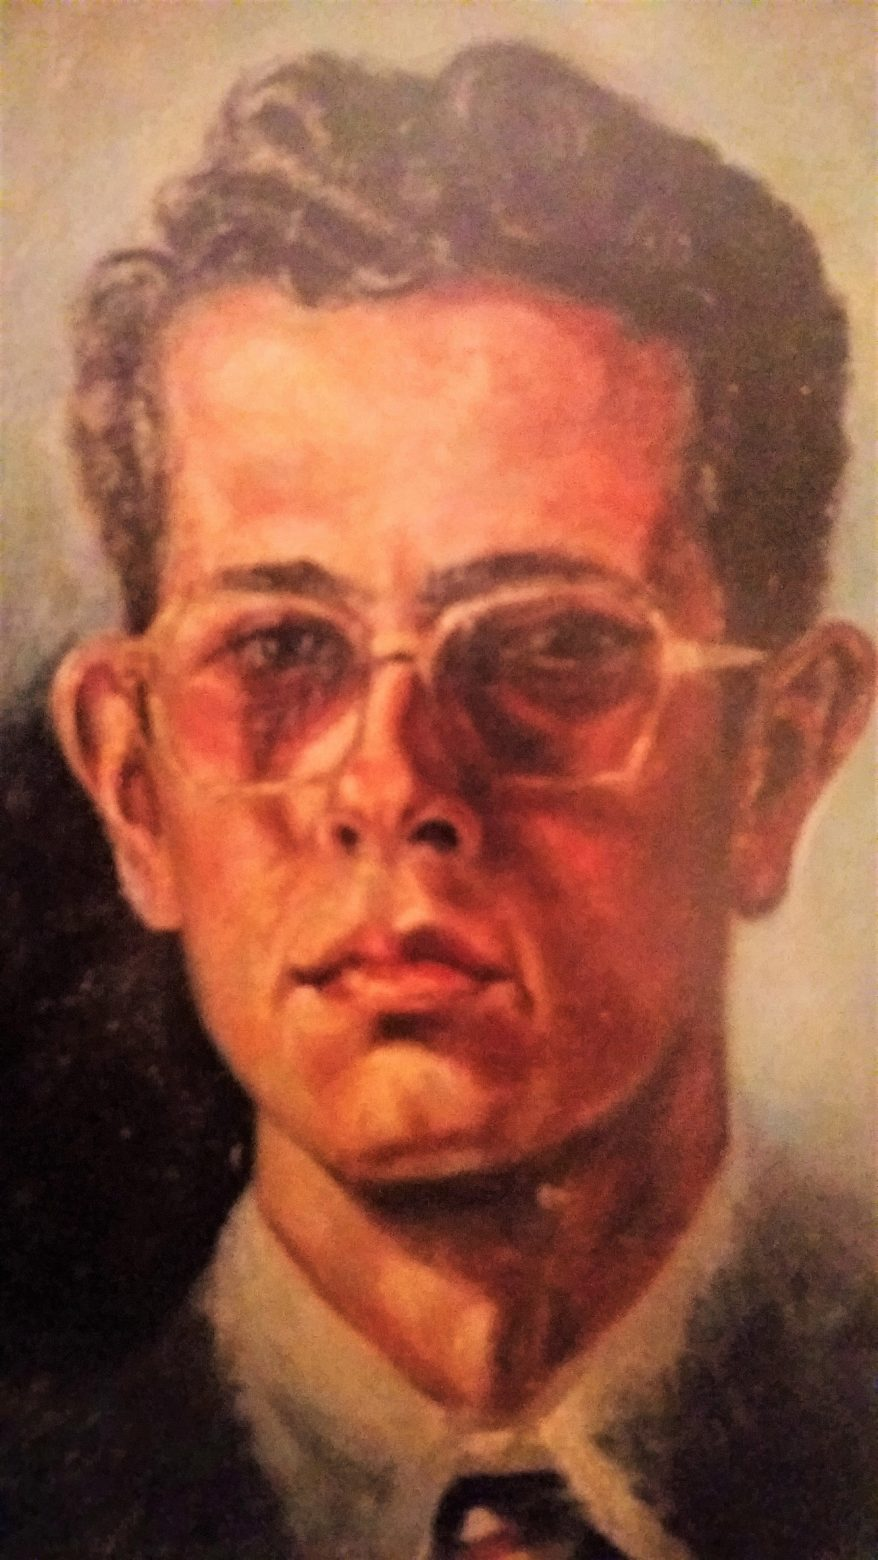 Juan Amo. (1950). Autorretrato. Óleo - Lienzo. 40 x 30.